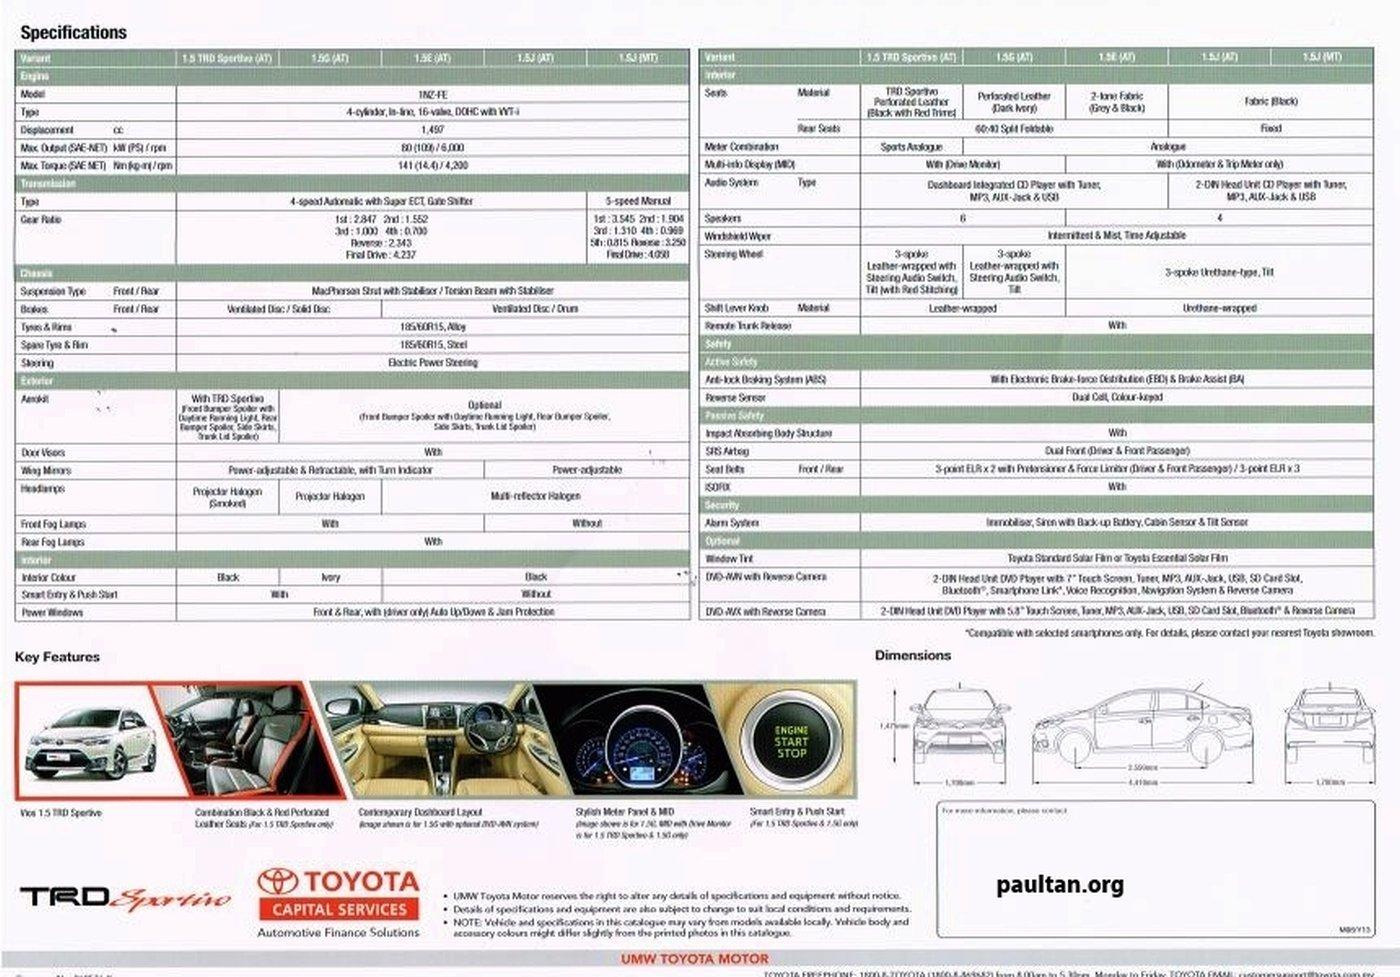 2013 Toyota Vios Specs List Pops Up On Oto My Paul Tan